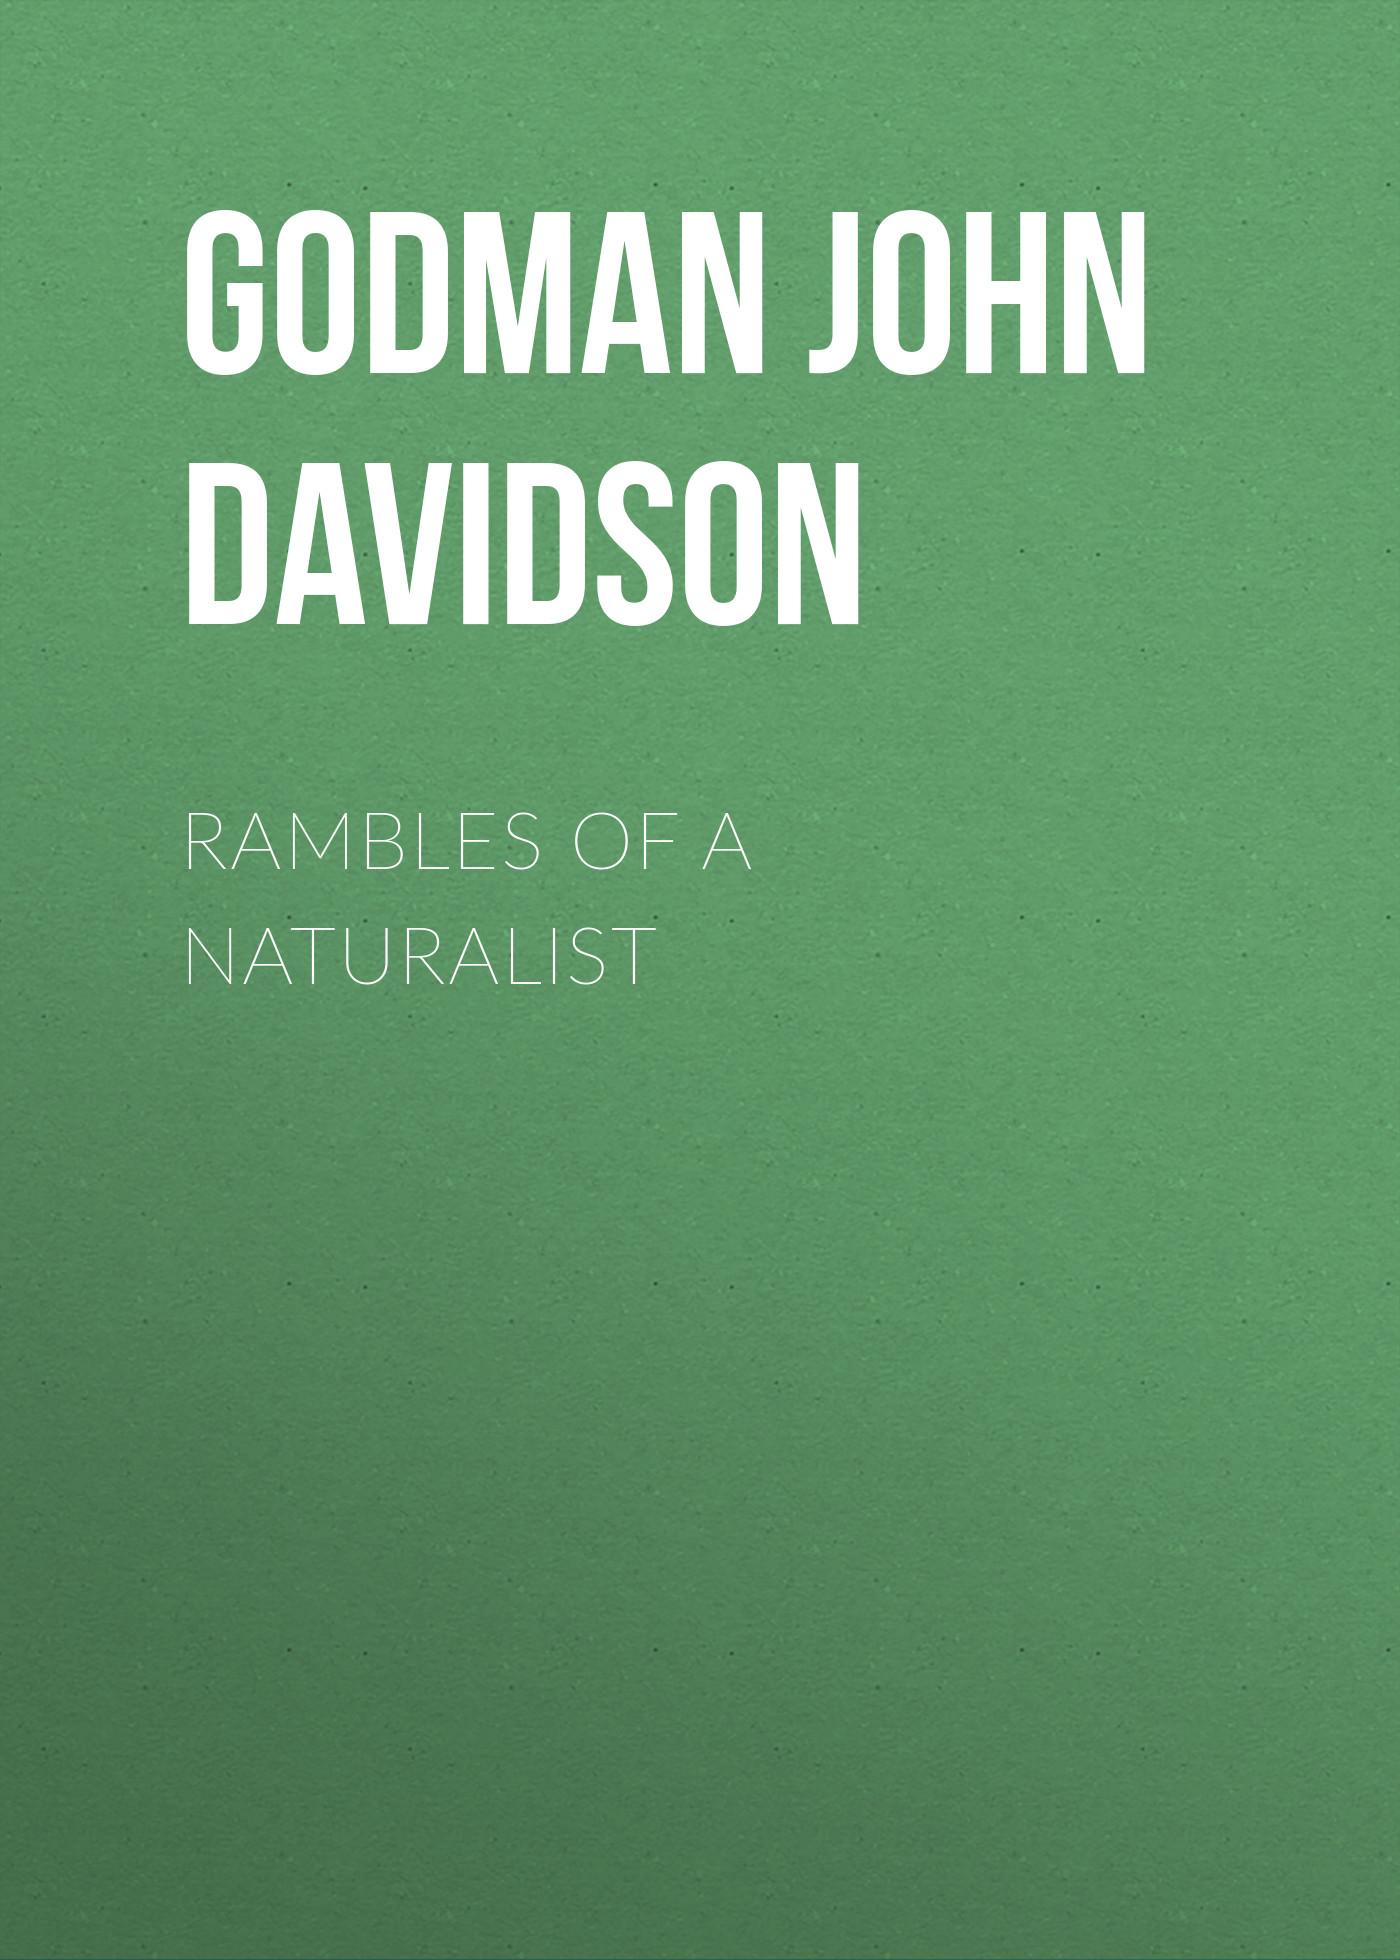 Godman John Davidson Rambles of a Naturalist carolyn davidson tempting a texan